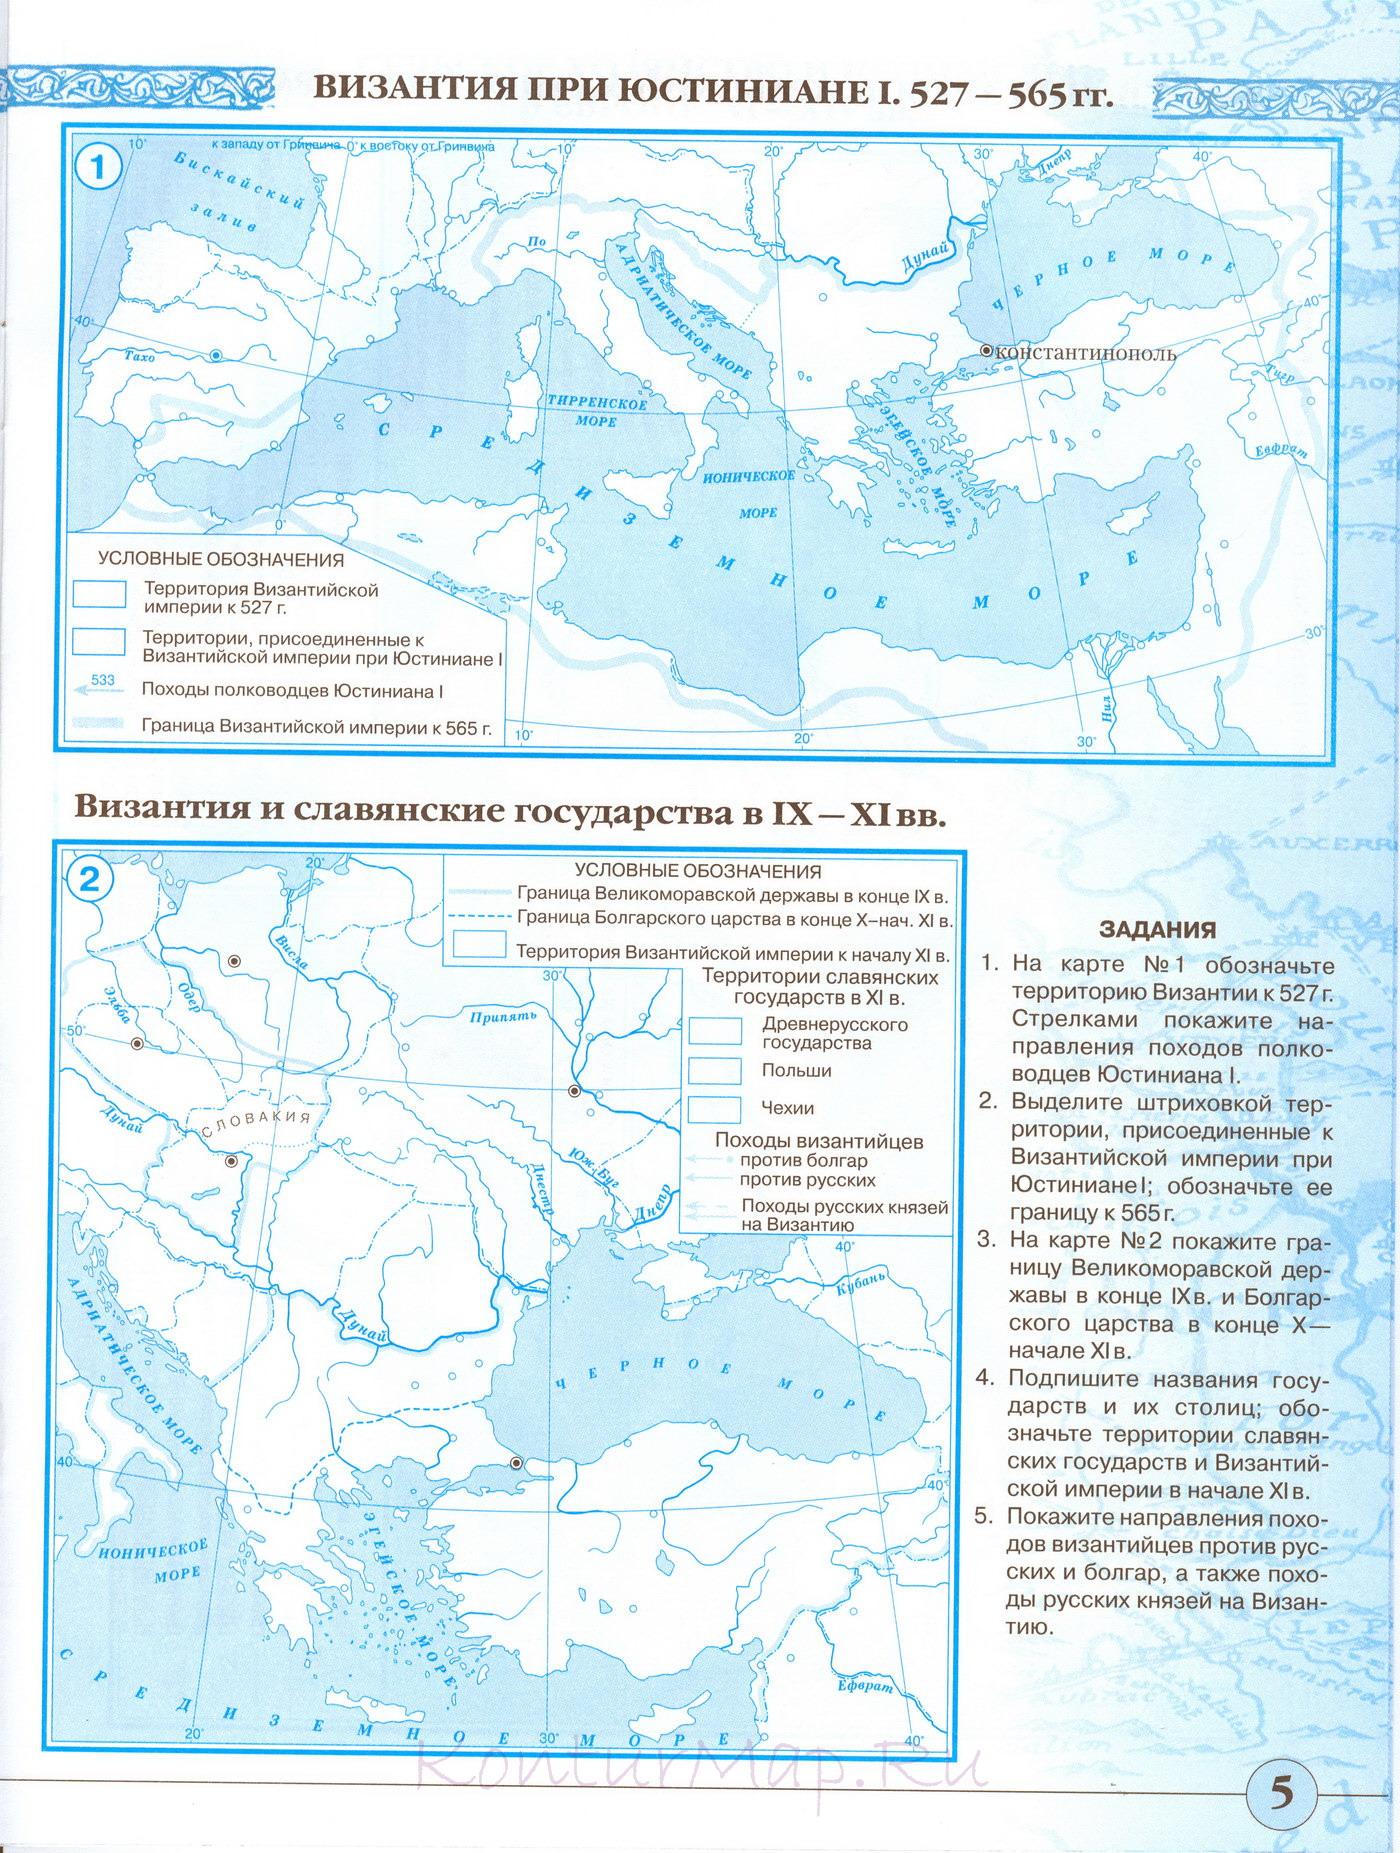 Византия и славянские государства контурная 6 класс дрофа карта 6 класс